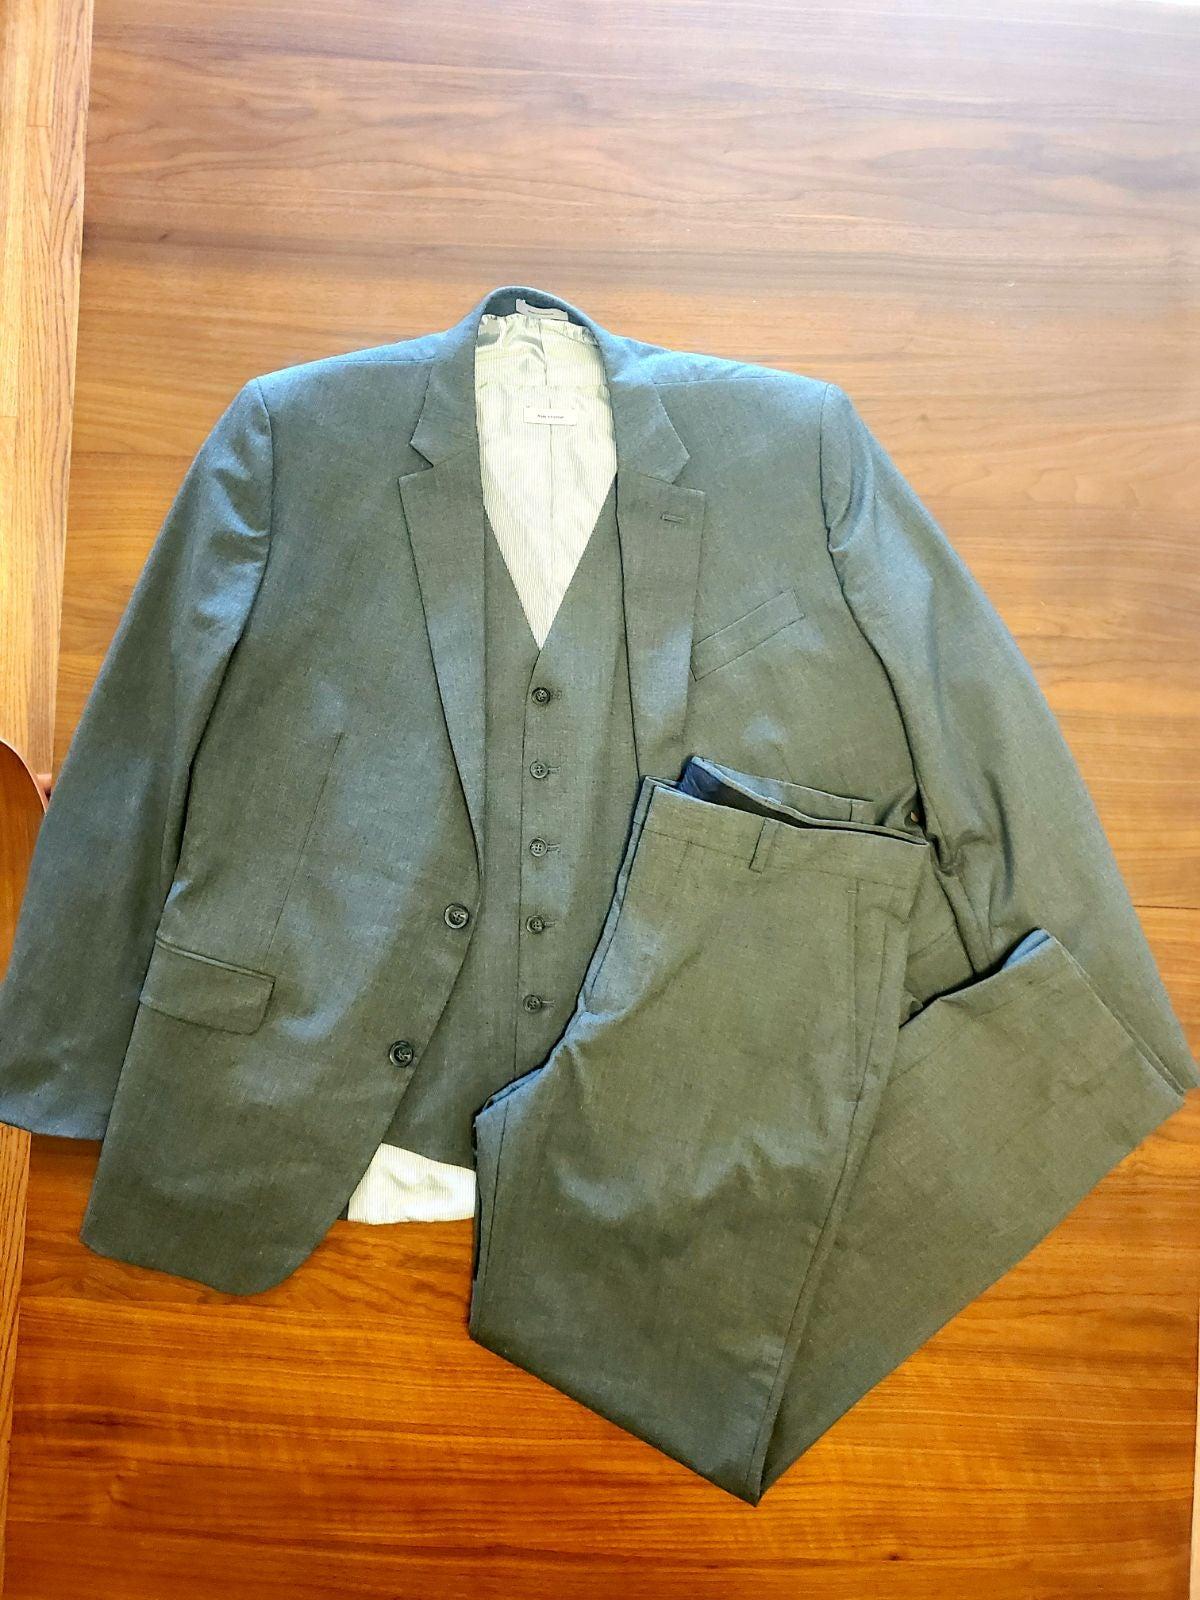 3 Piece Men's Gray Suit